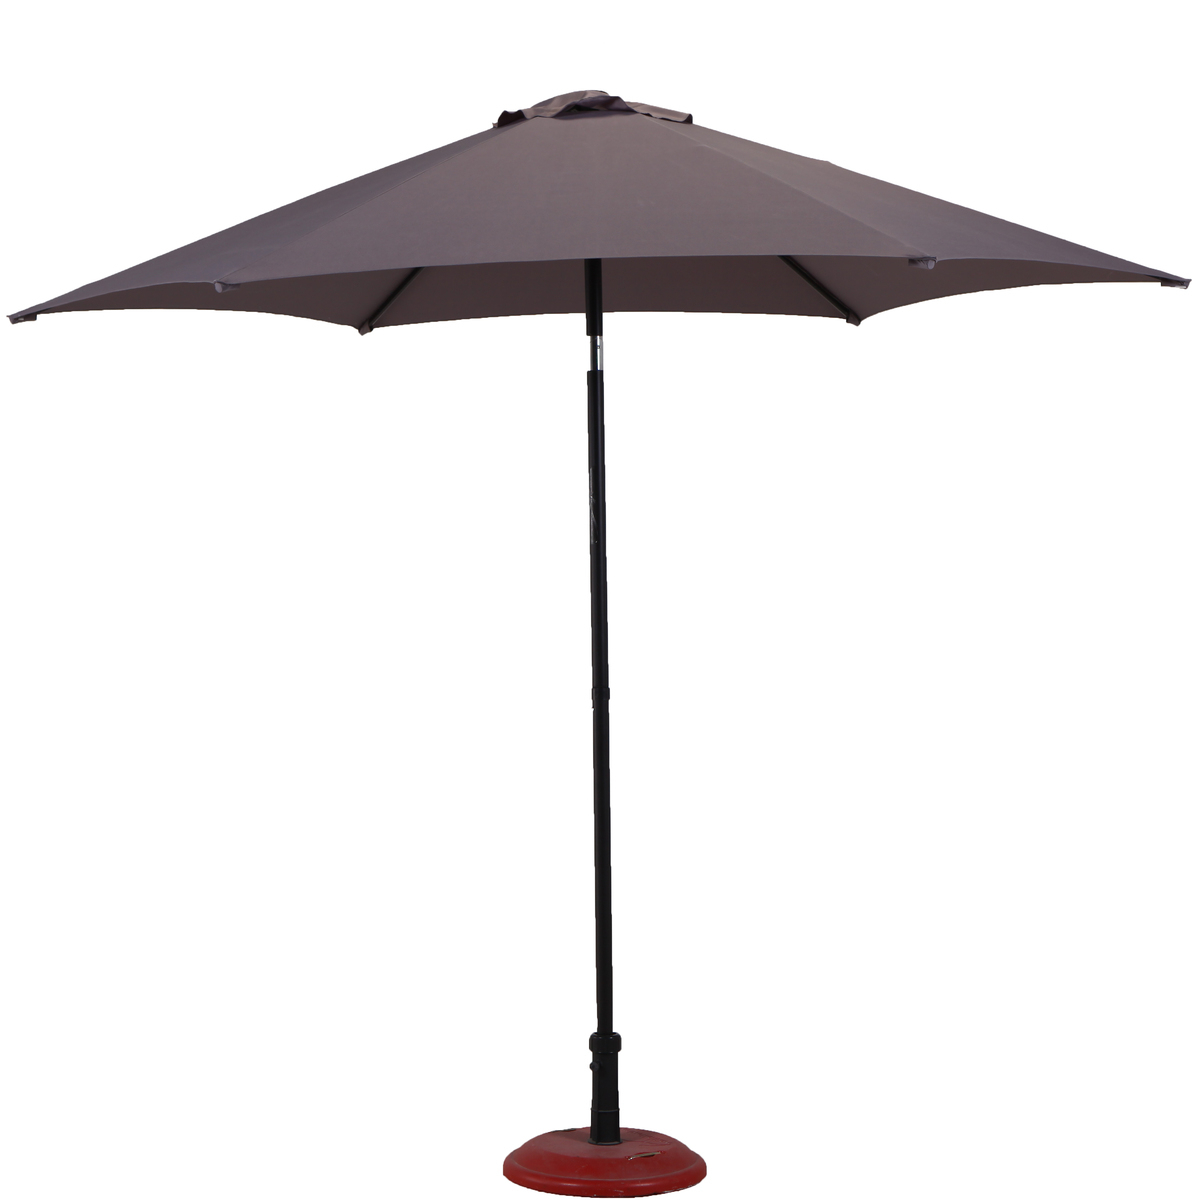 House & Home Market Umbrella (View 14 of 20)